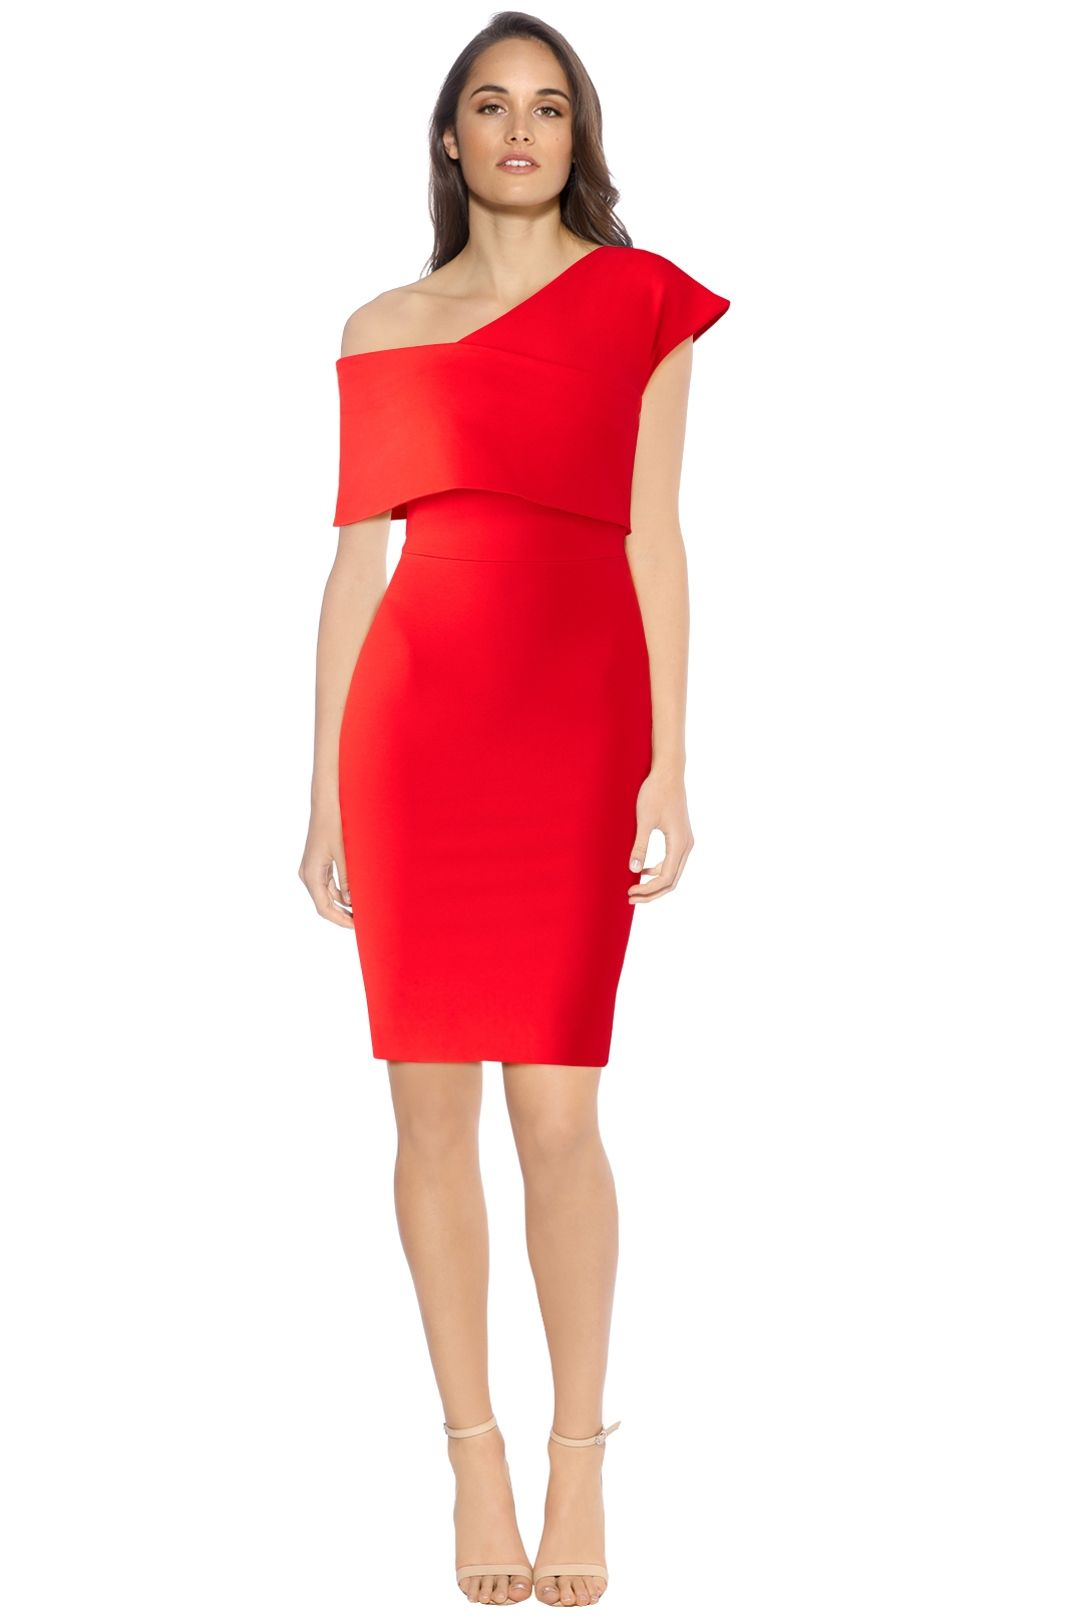 Elliatt - Emulate Dress - Red - Front